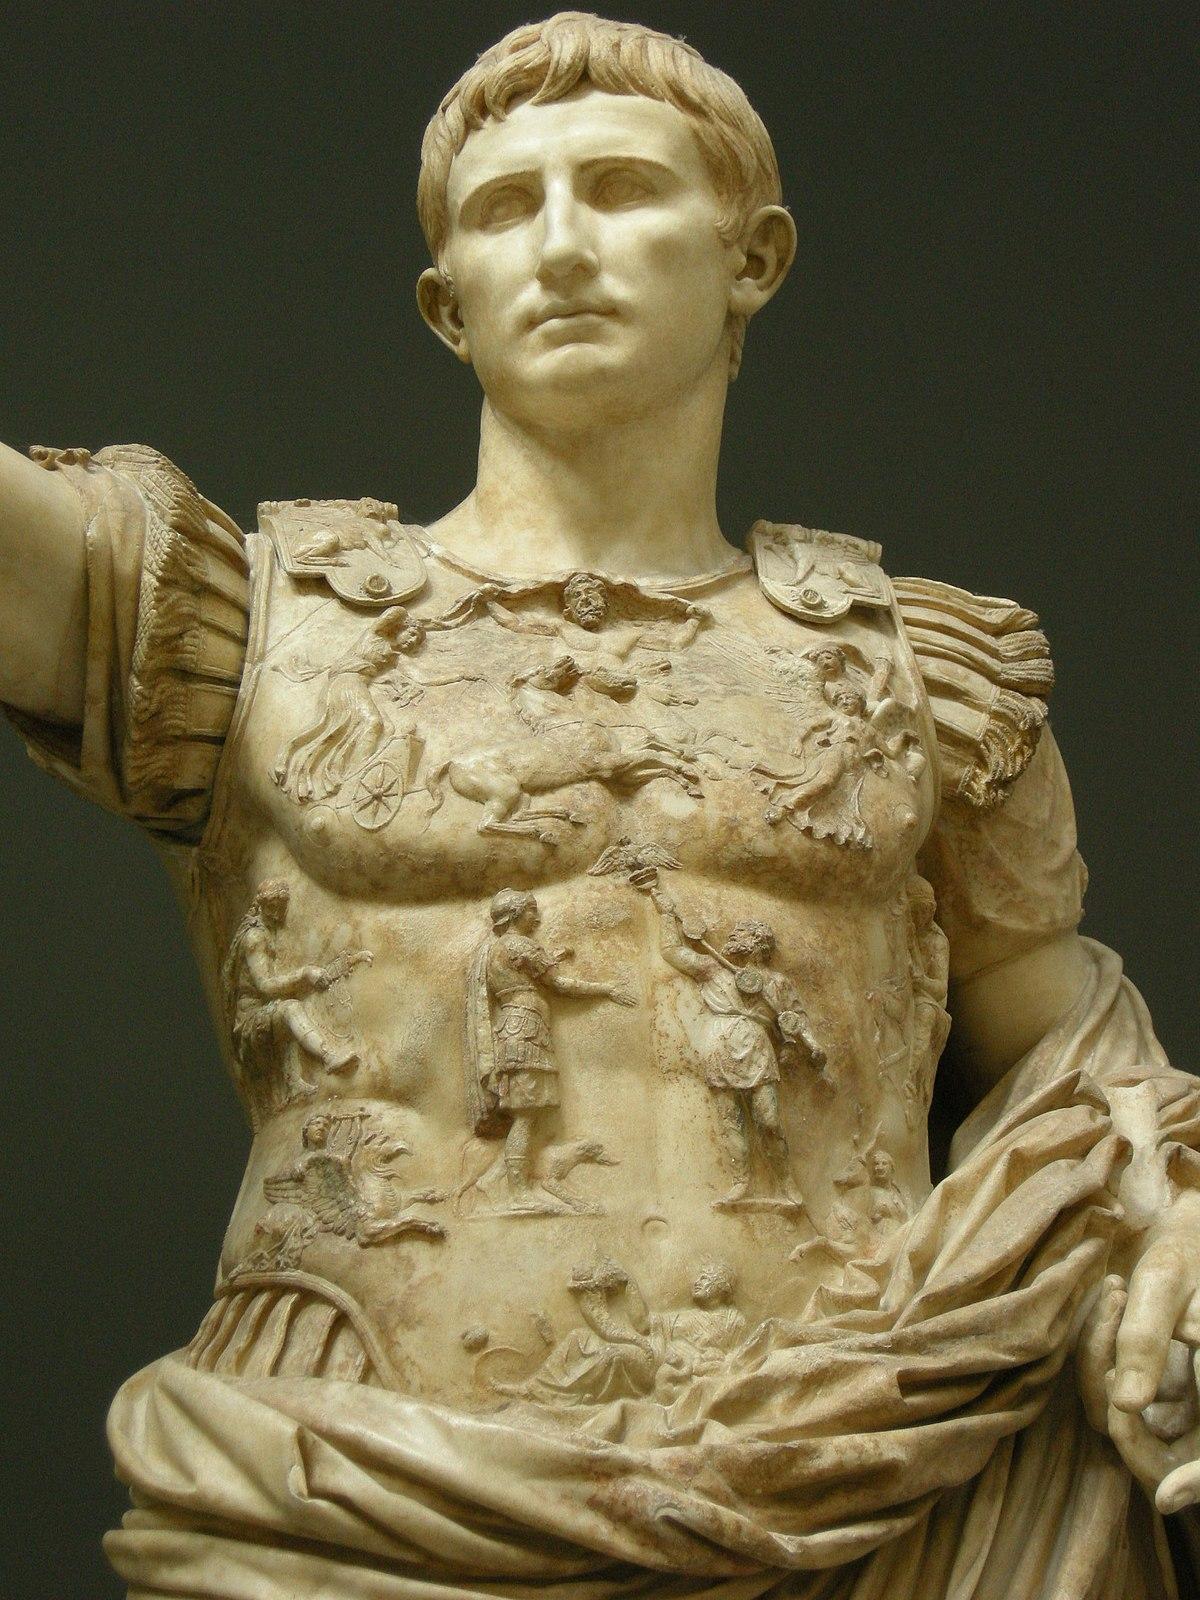 Augusto di pirma porta, inv. 2290, 02.JPG